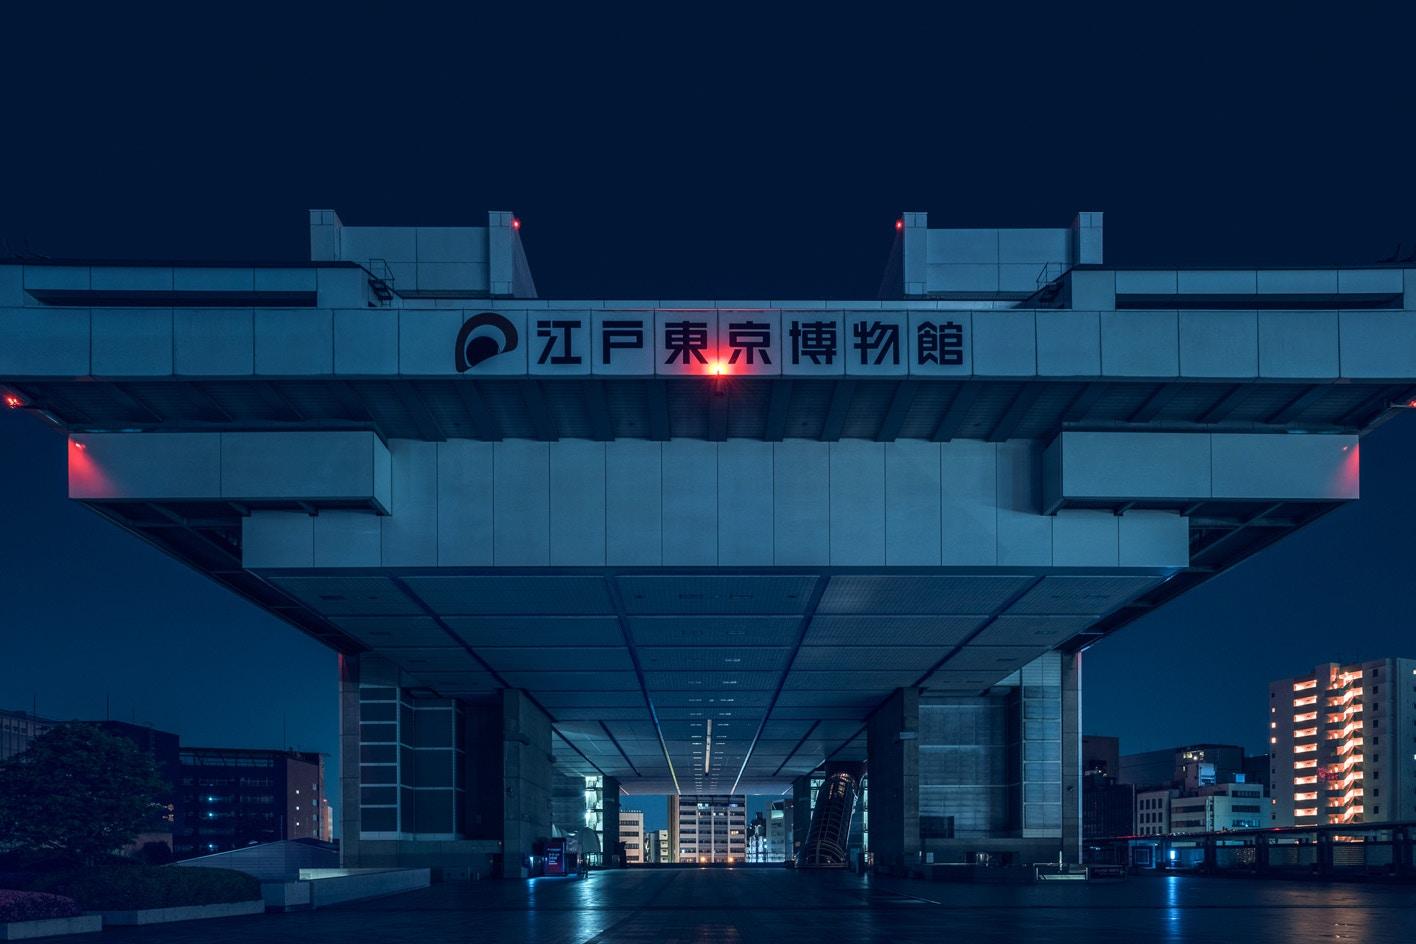 tom-blachford-nihon-noir-tokyo-photography-2.jpg